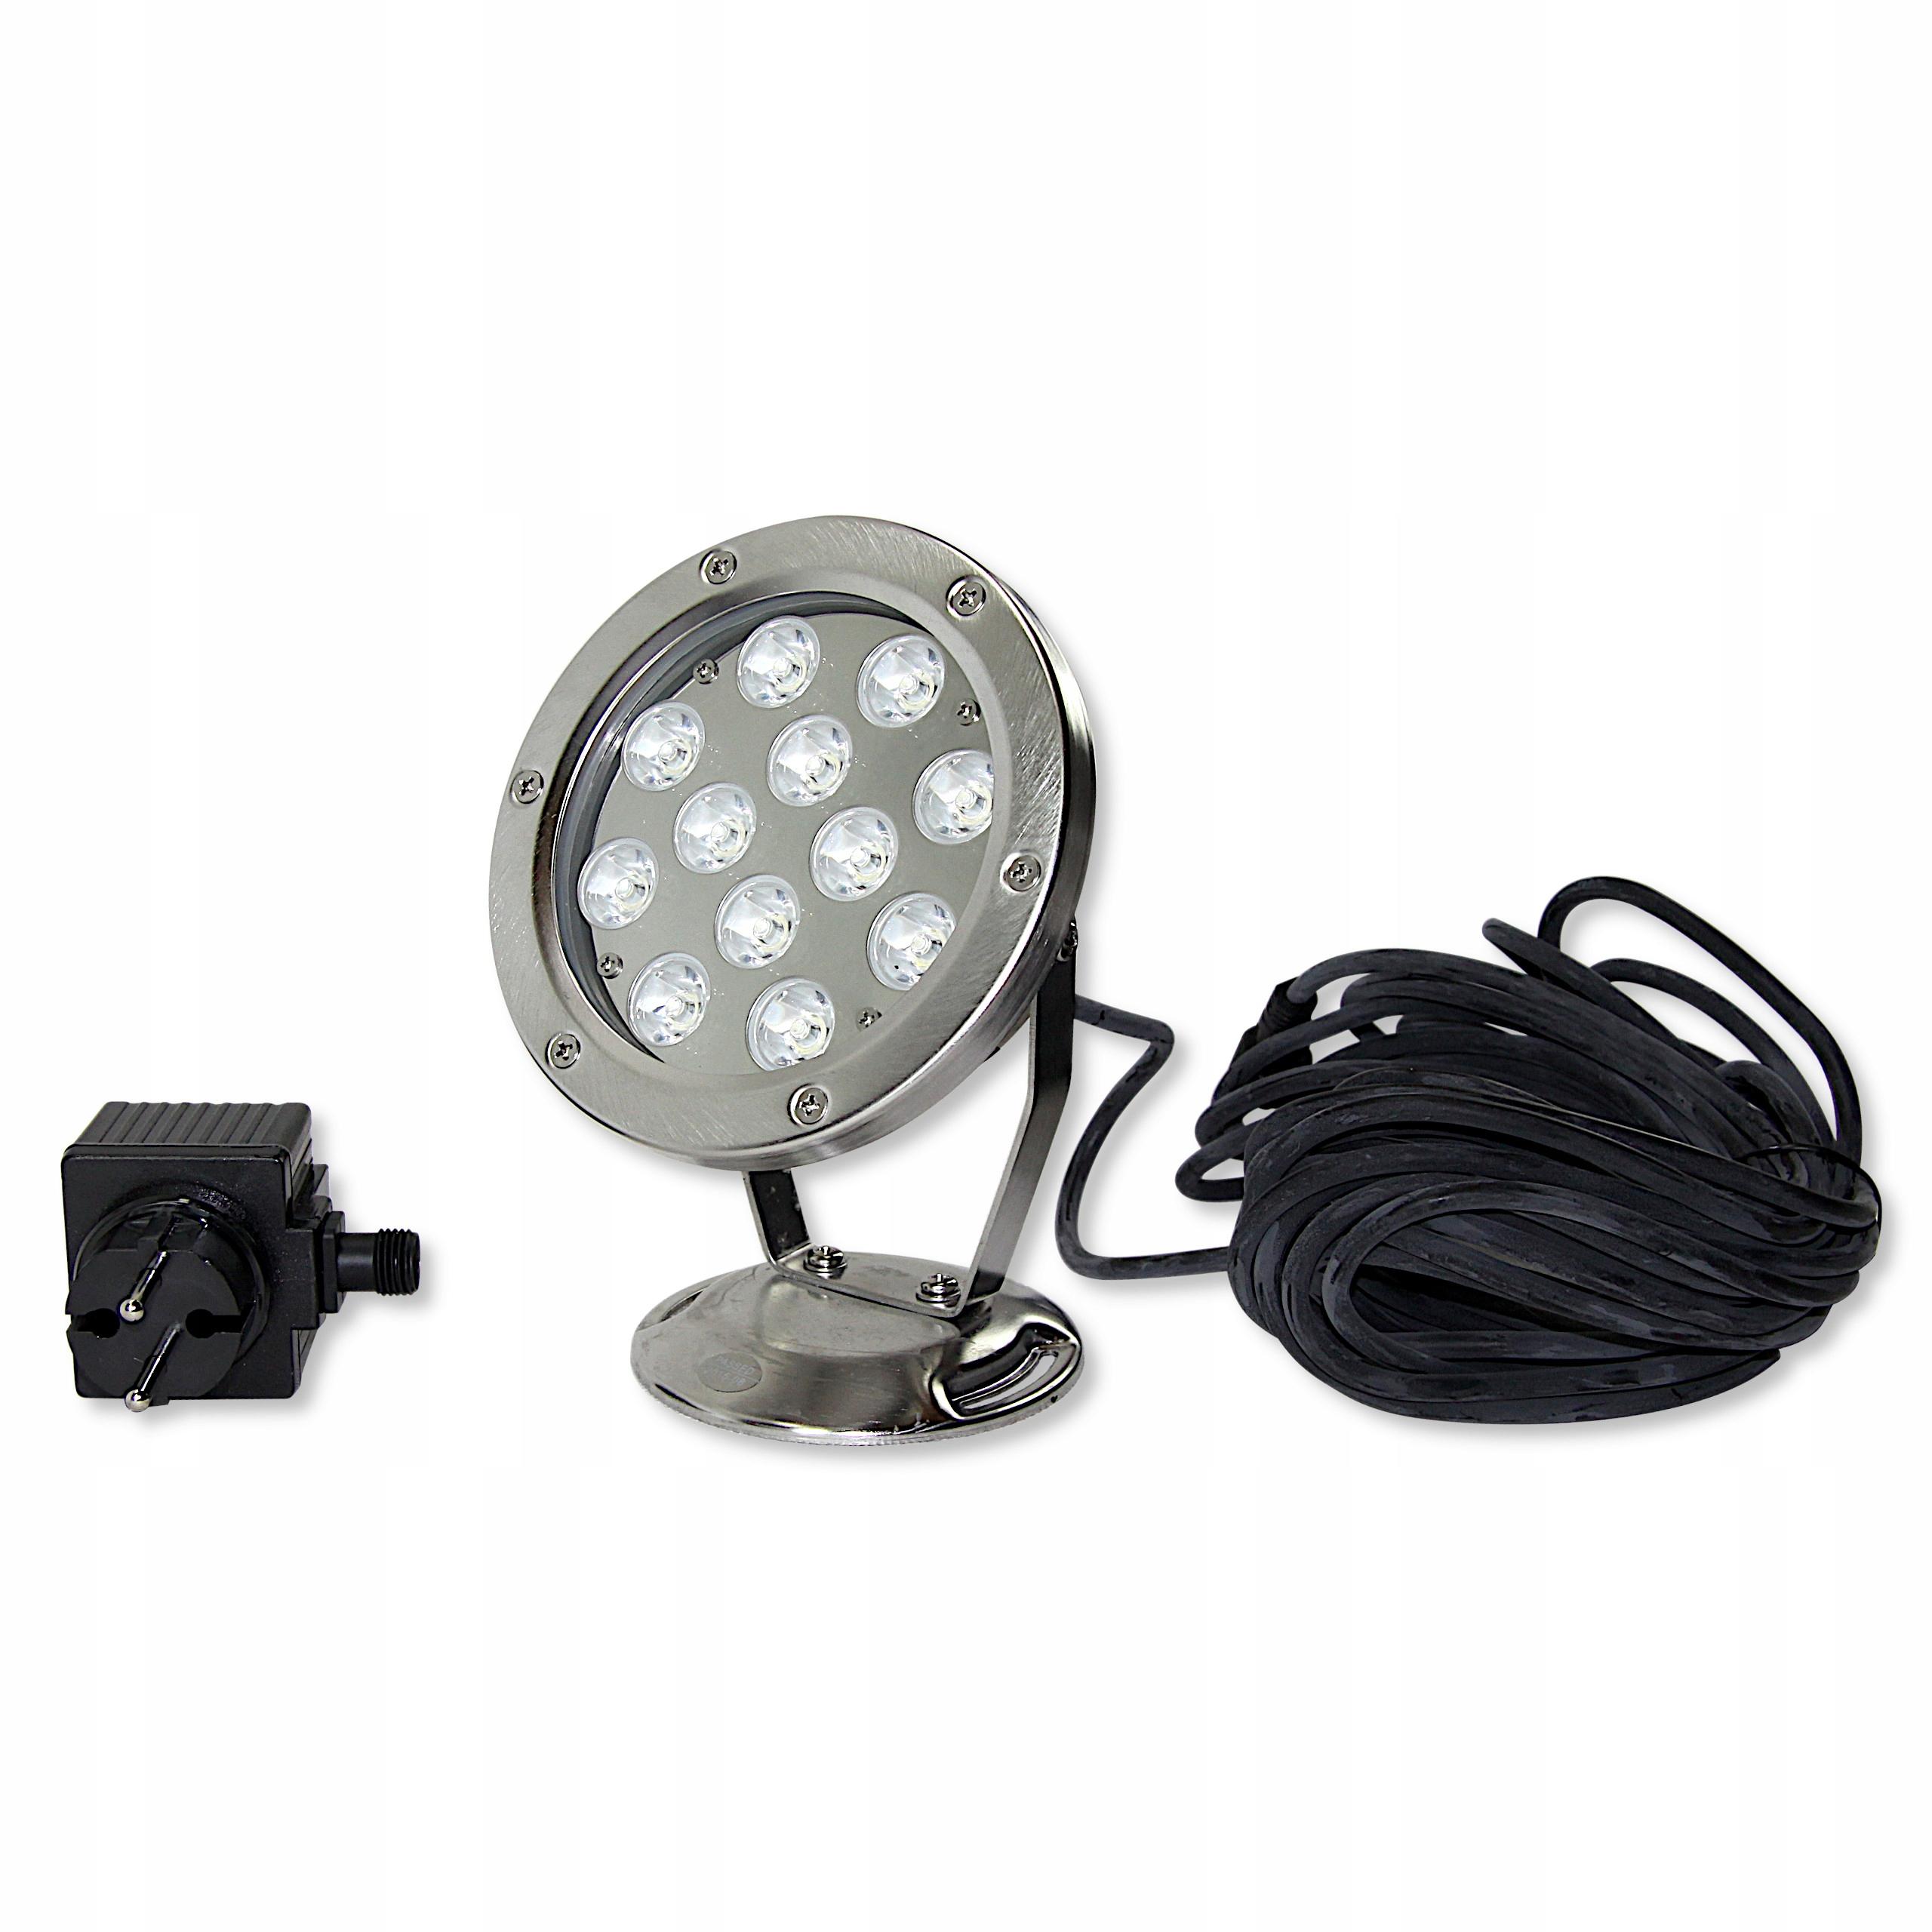 LAMPA LED - REFLEKTOR ZE STALI QL 26 12W BIAŁY